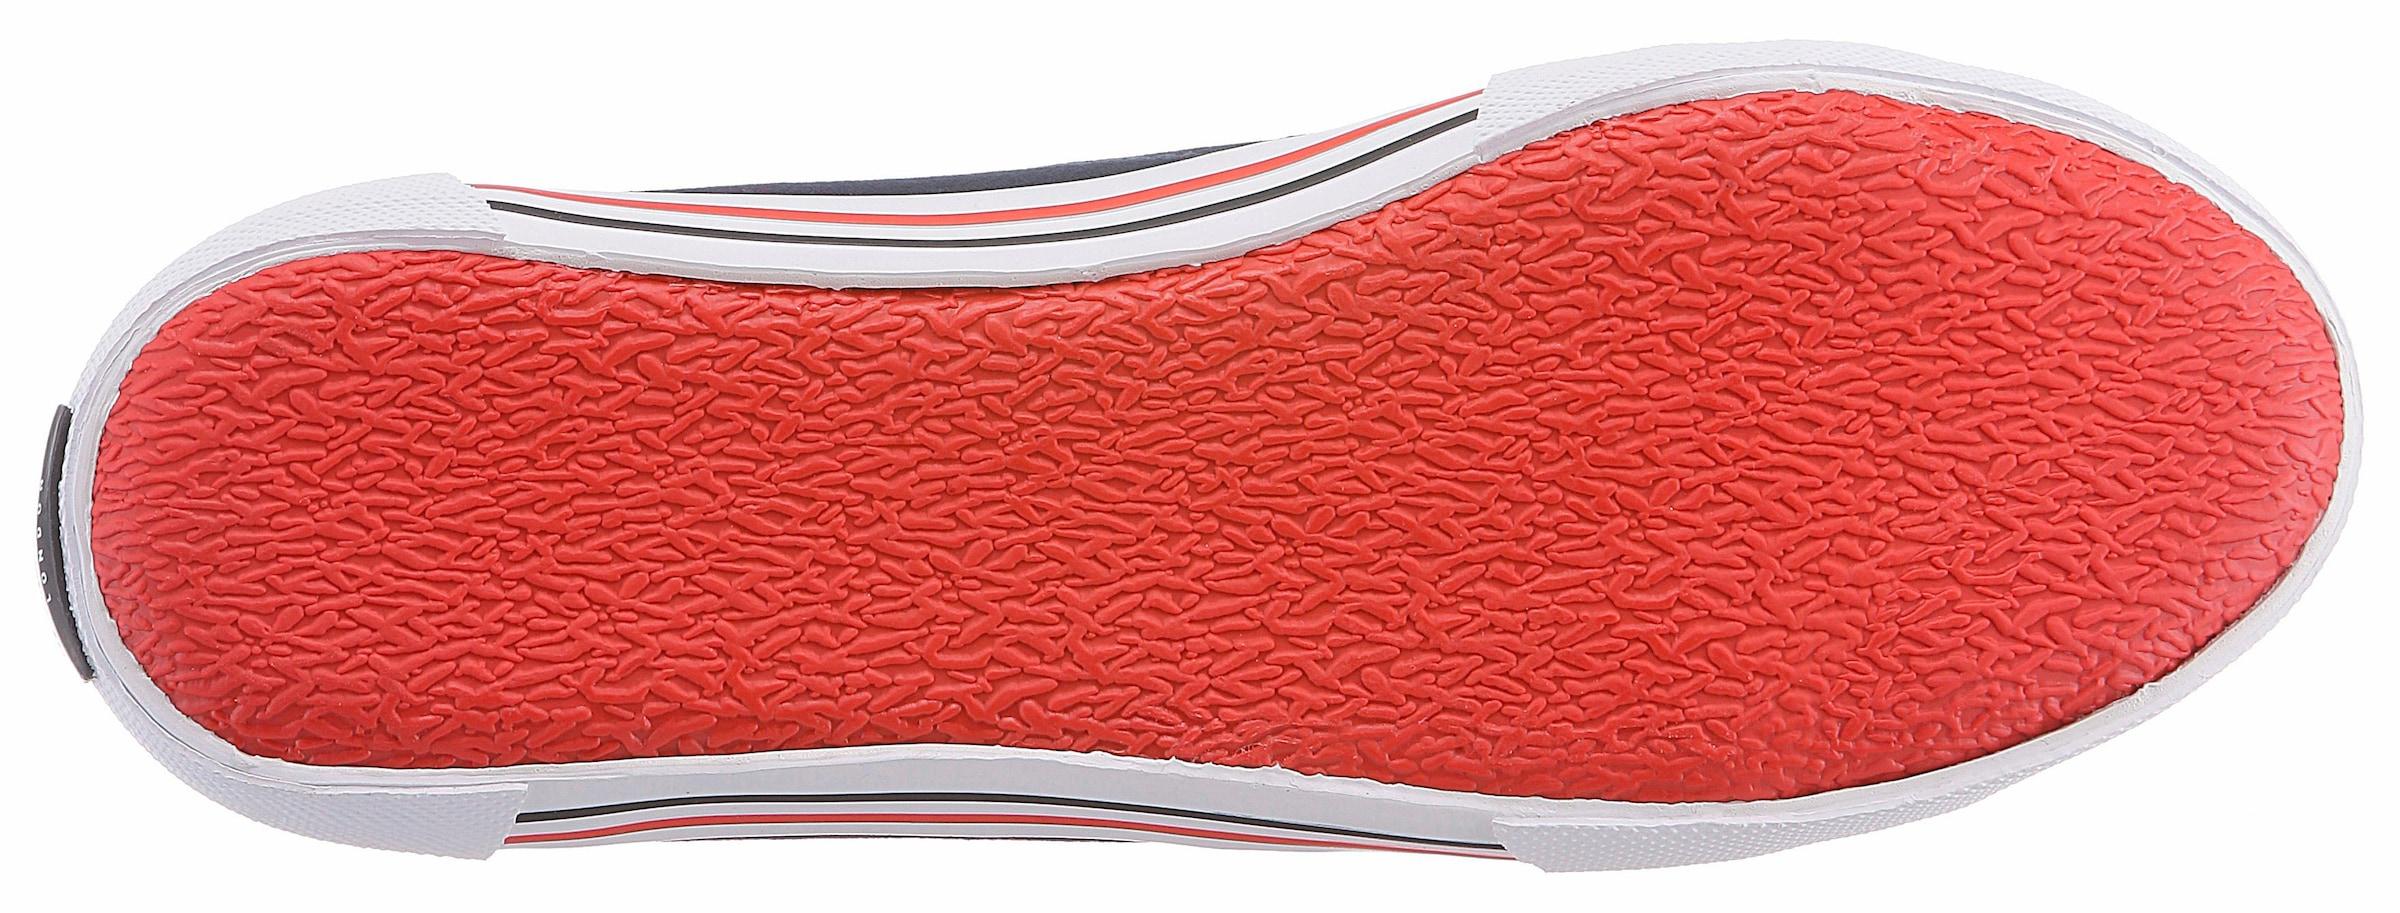 Pepe Jeans Jeans Jeans Sneaker  ;ABERLADY BASIC shoppen | Gutes Preis-Leistungs-Verhältnis, es lohnt sich fa7f1e